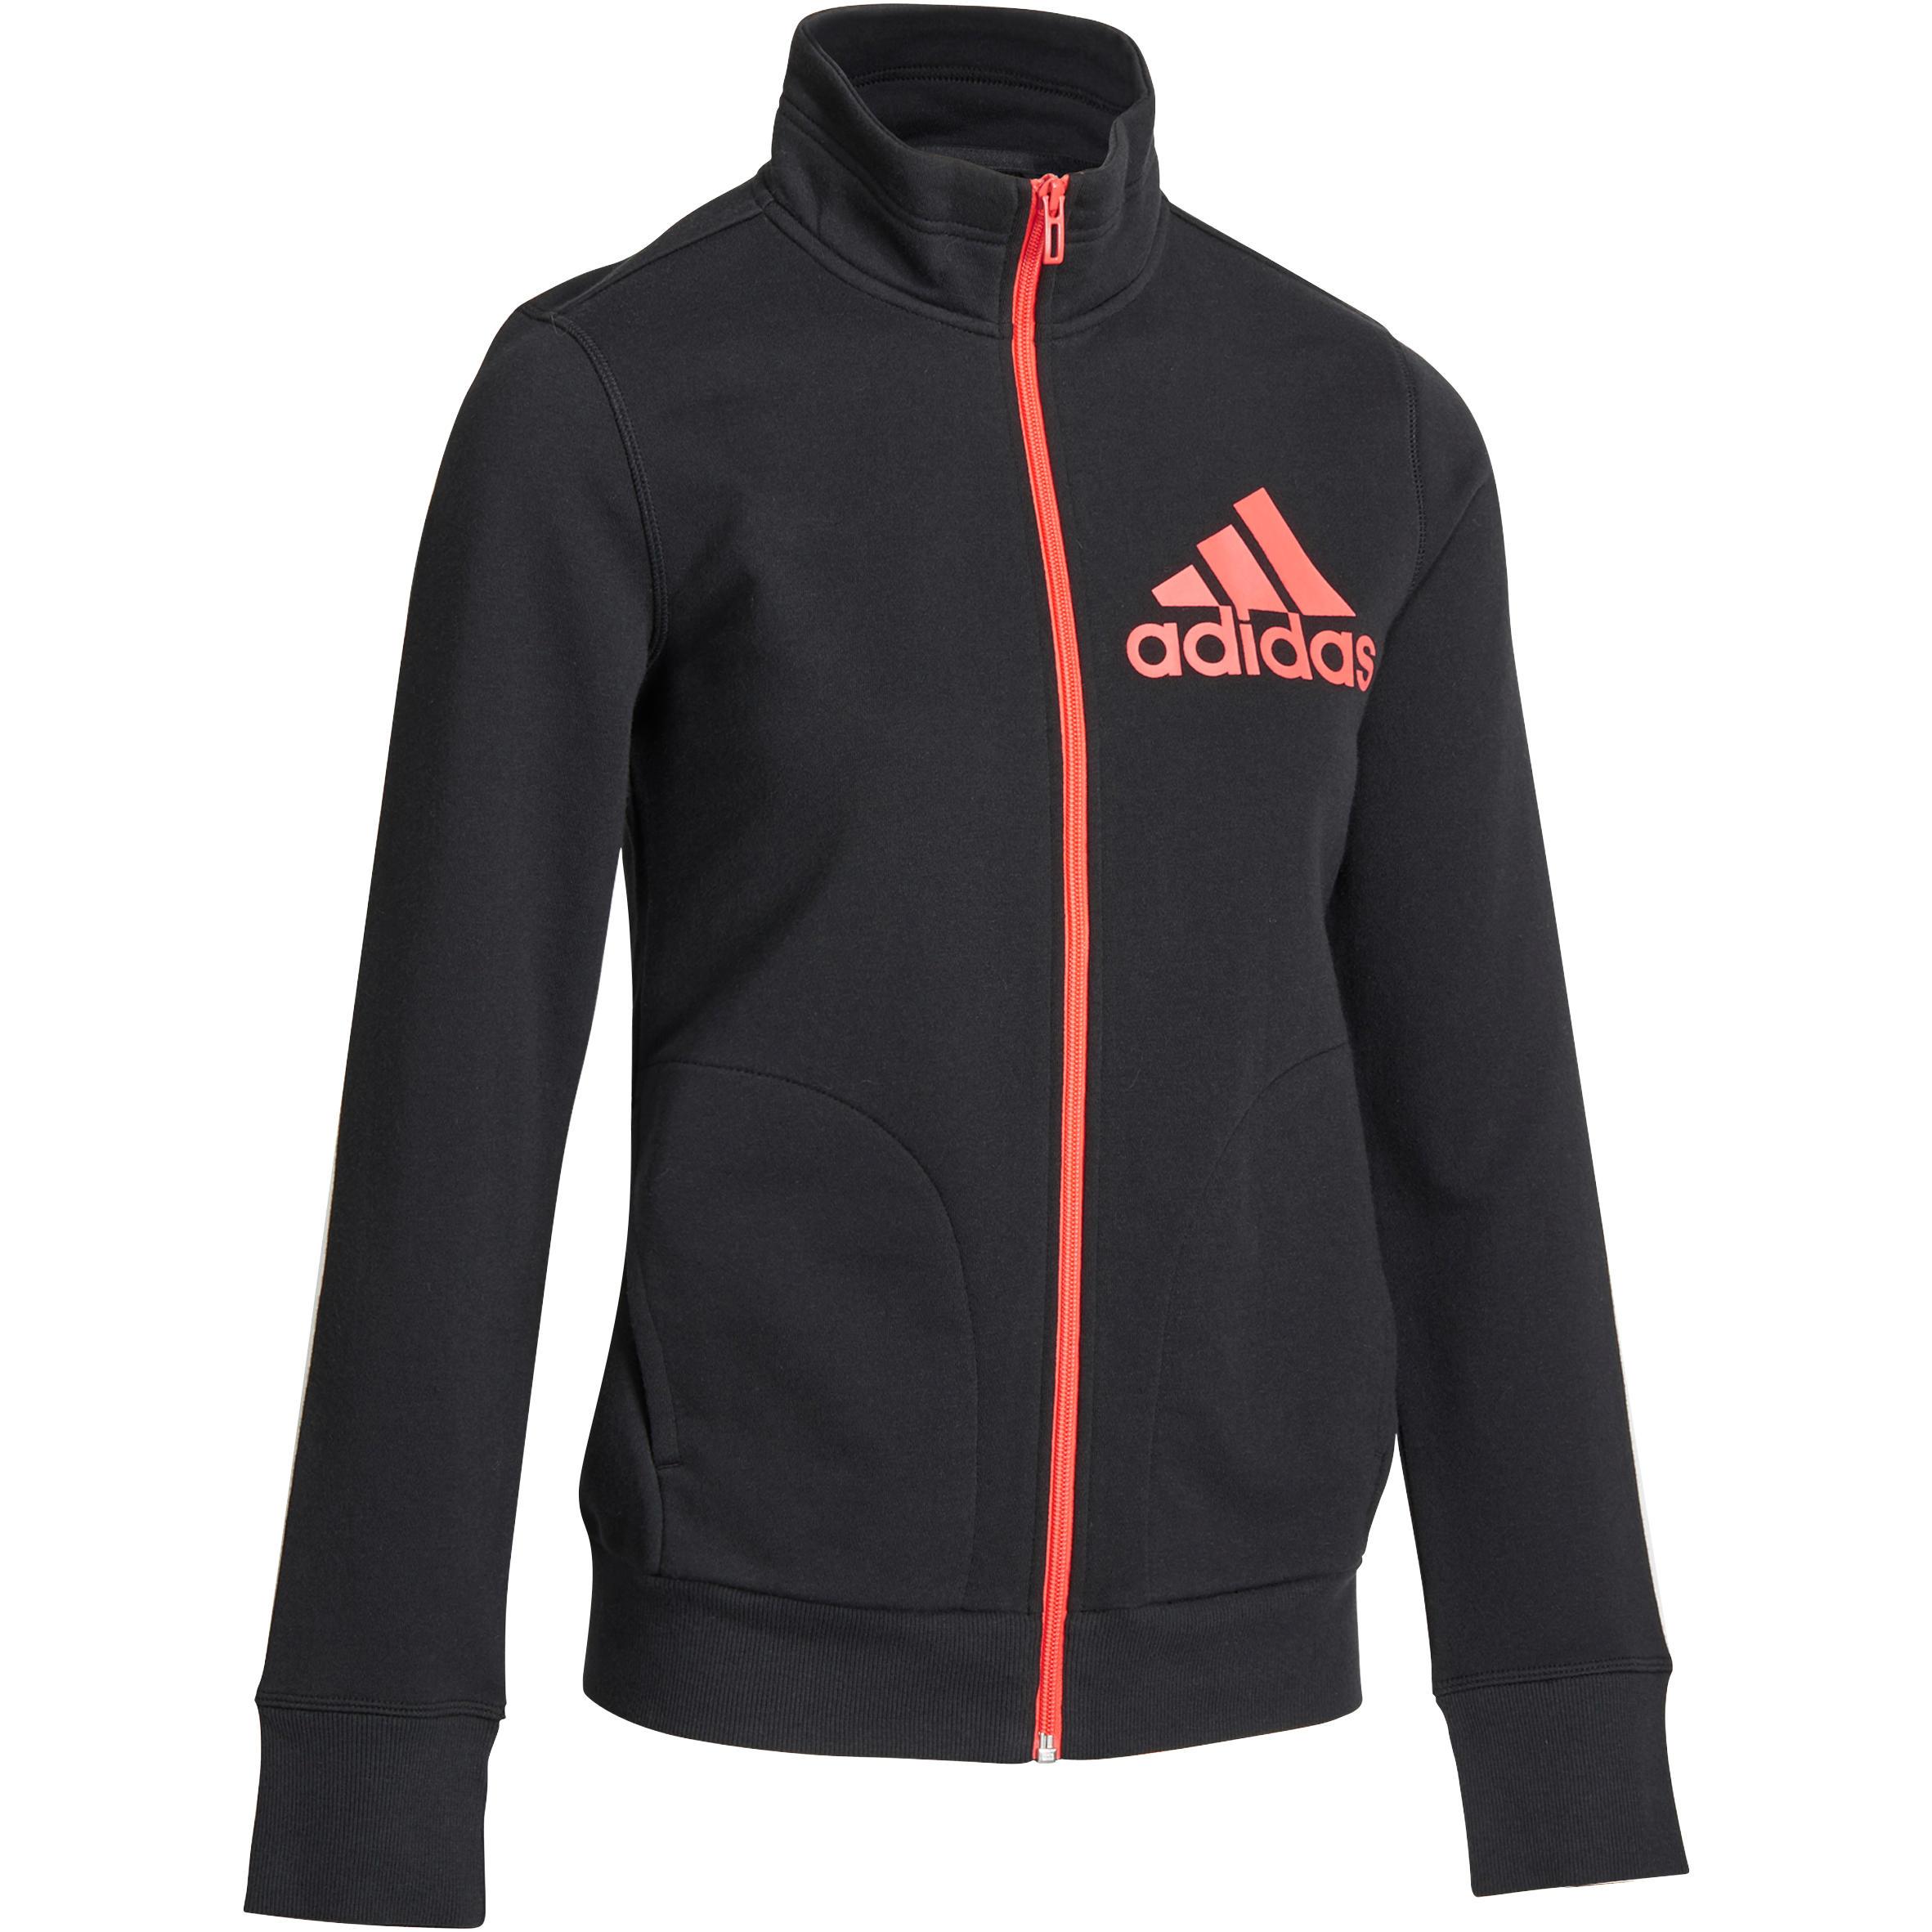 Adidas Damesvest voor gym en pilates zwart/oranje